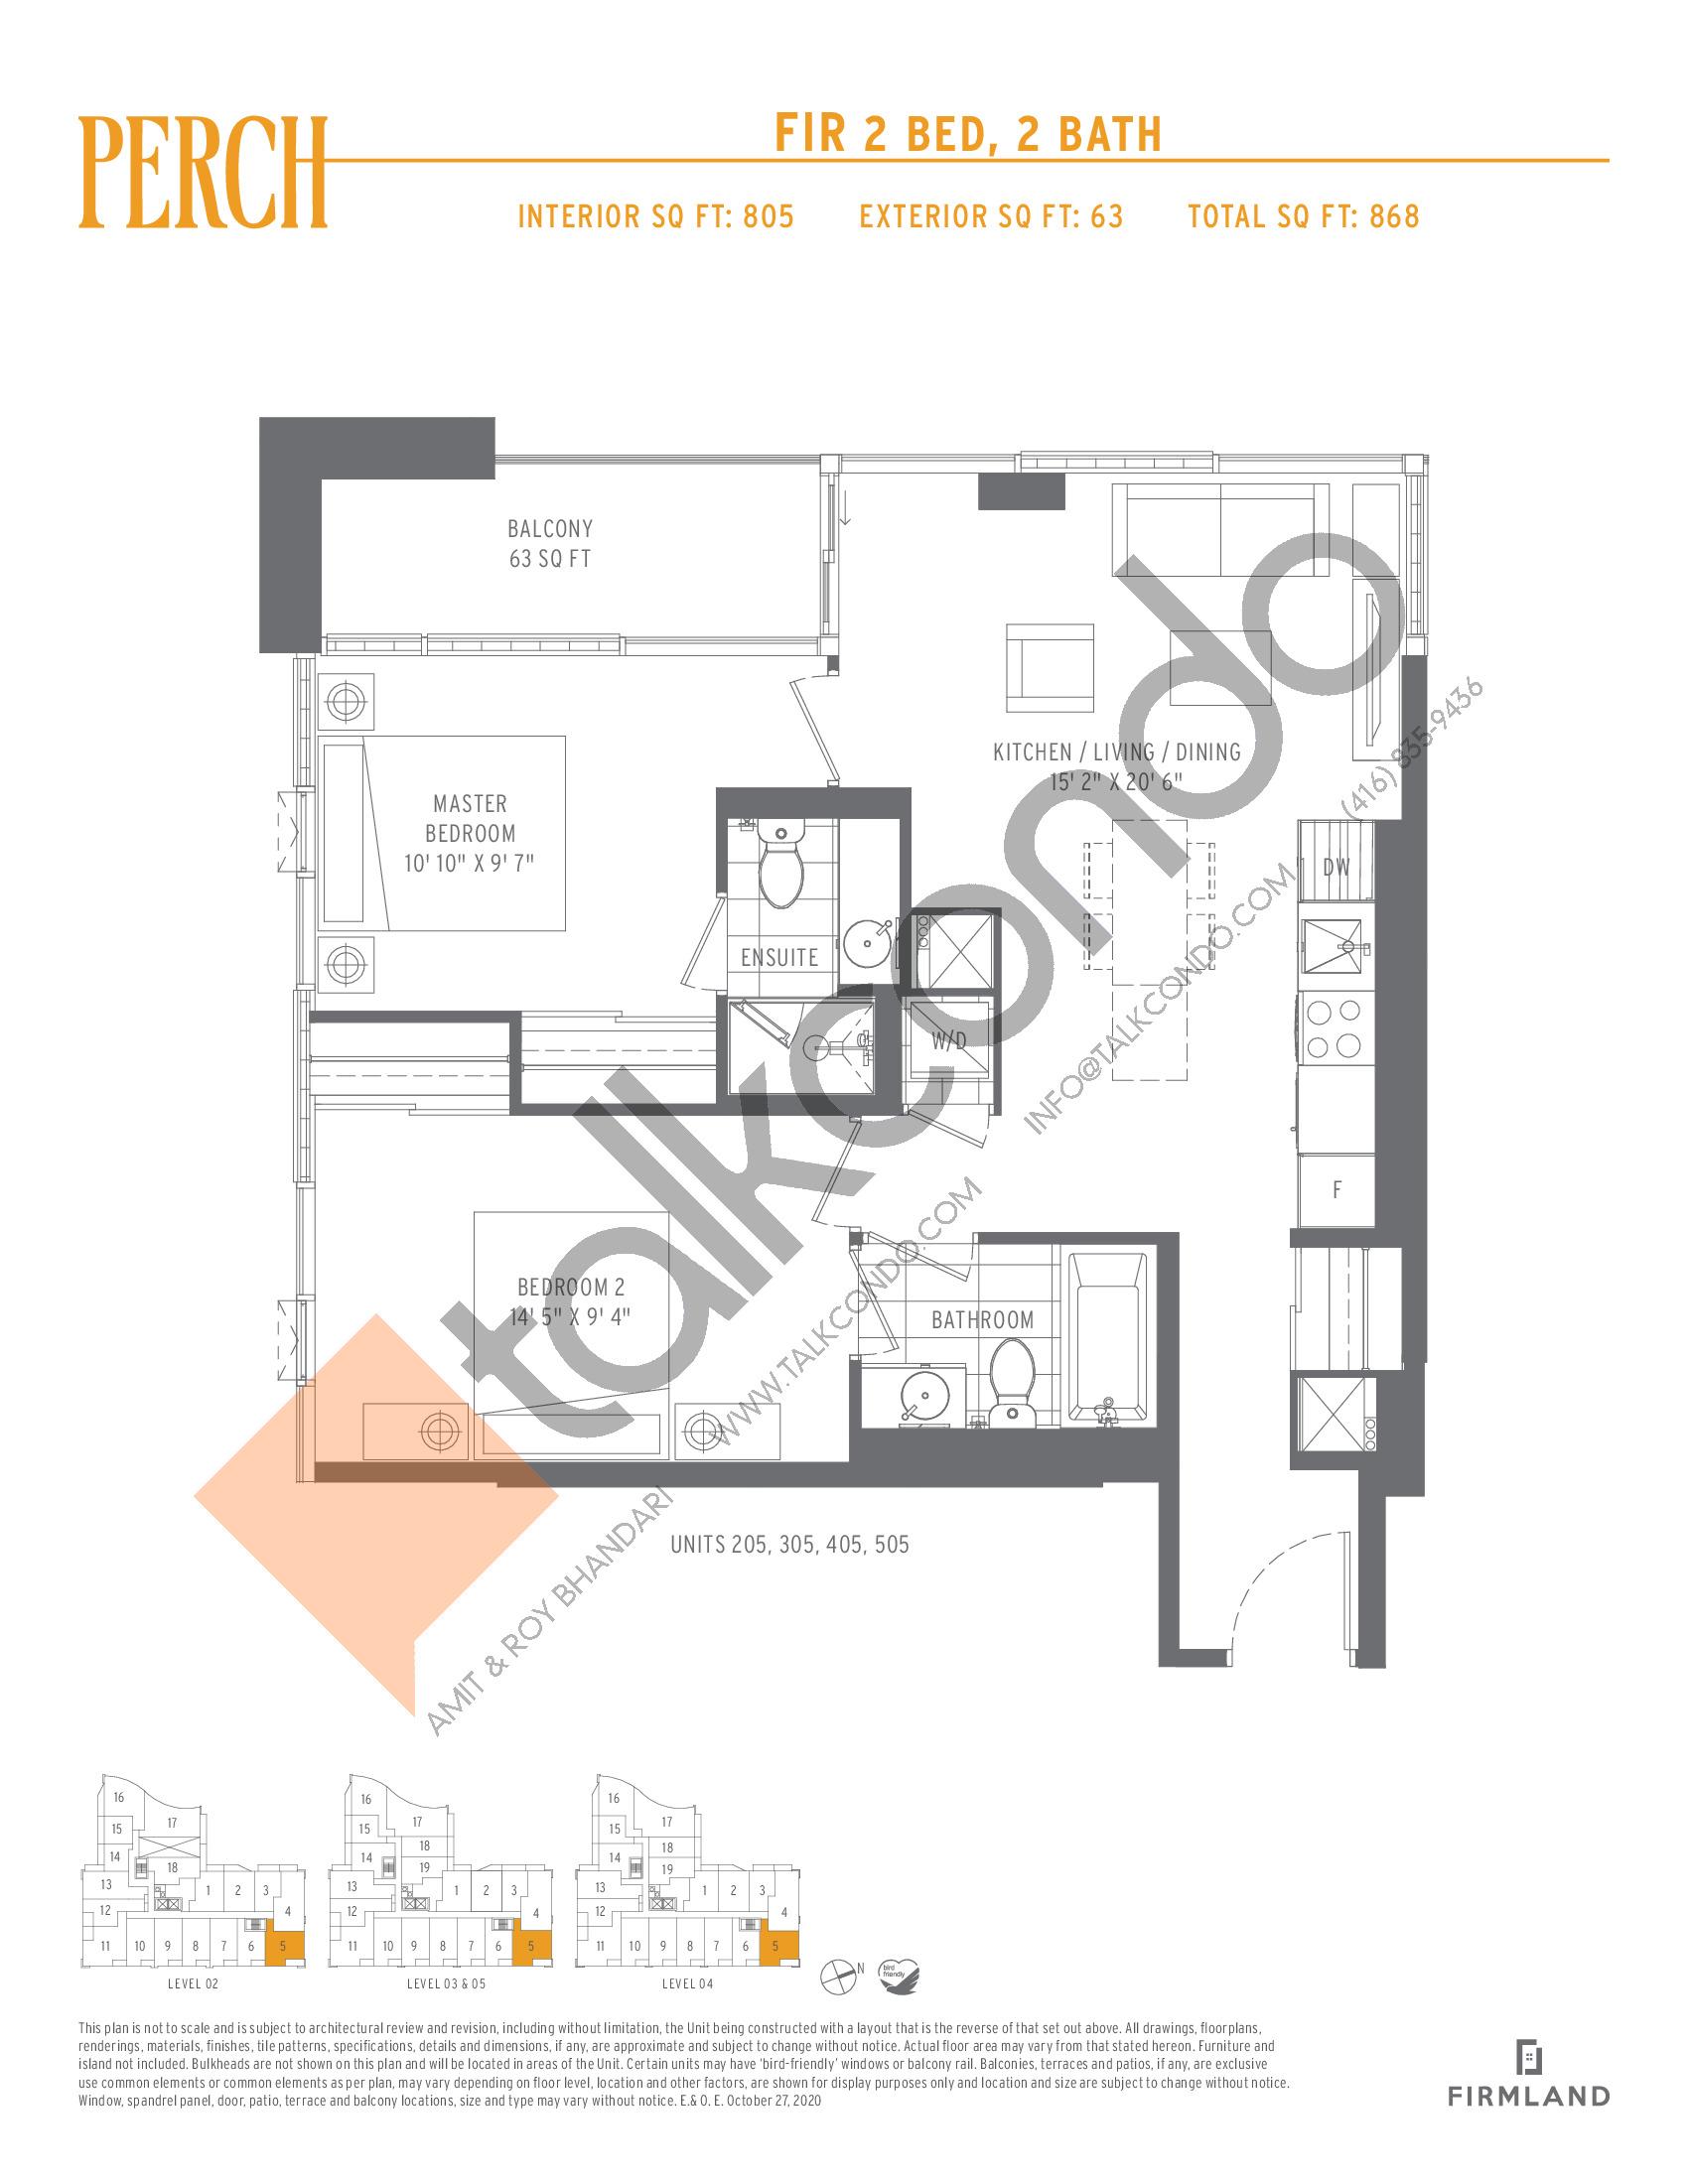 Fir Floor Plan at Perch Condos - 805 sq.ft